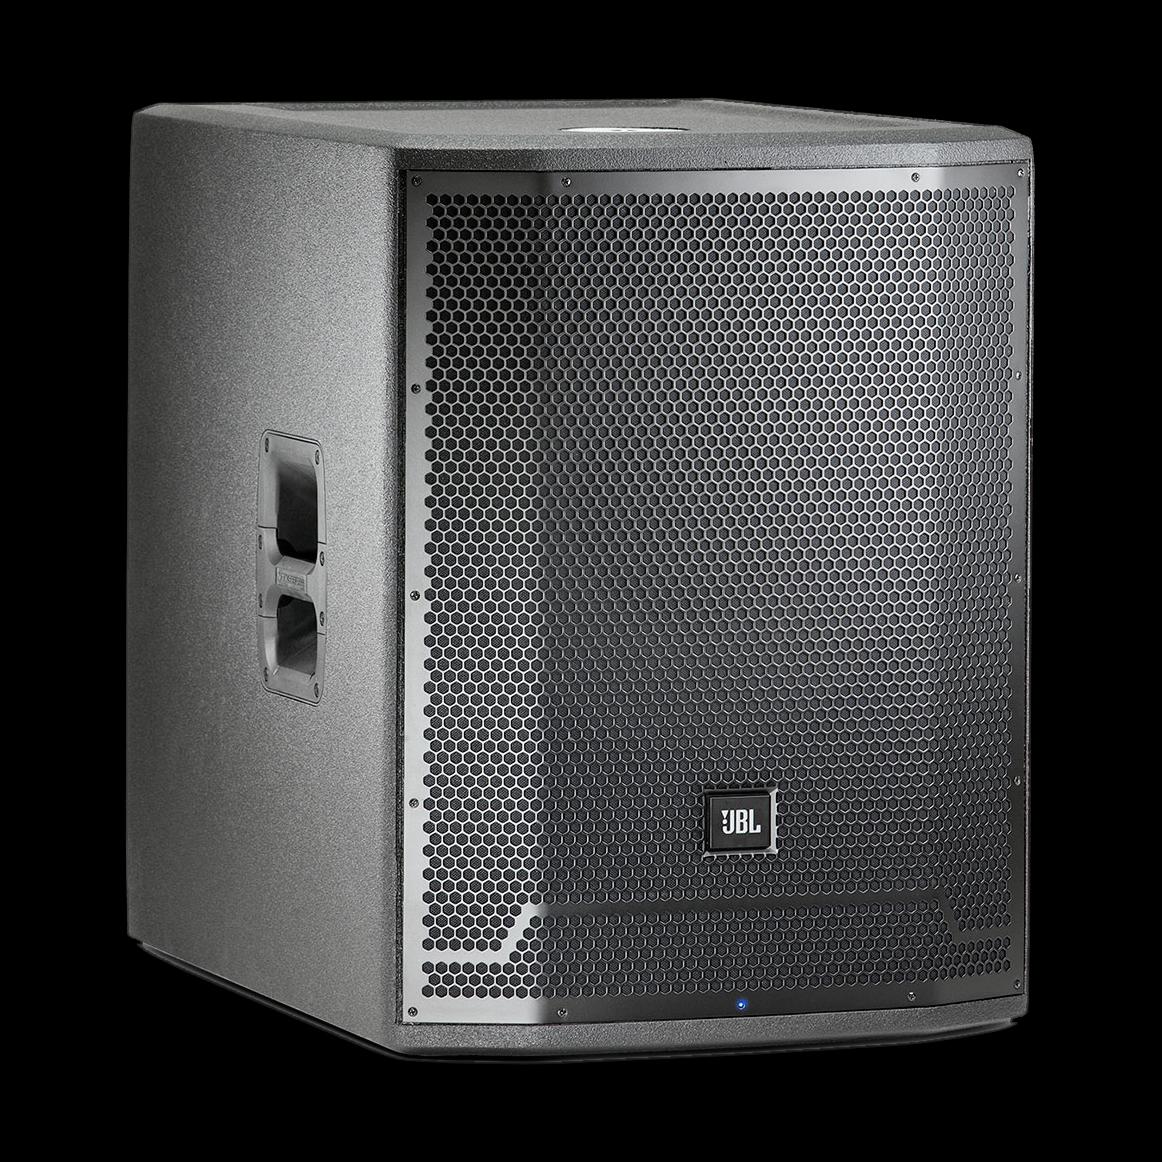 jbl prx700 prx718 s xlf grille voor luidsprekerhoes baseline